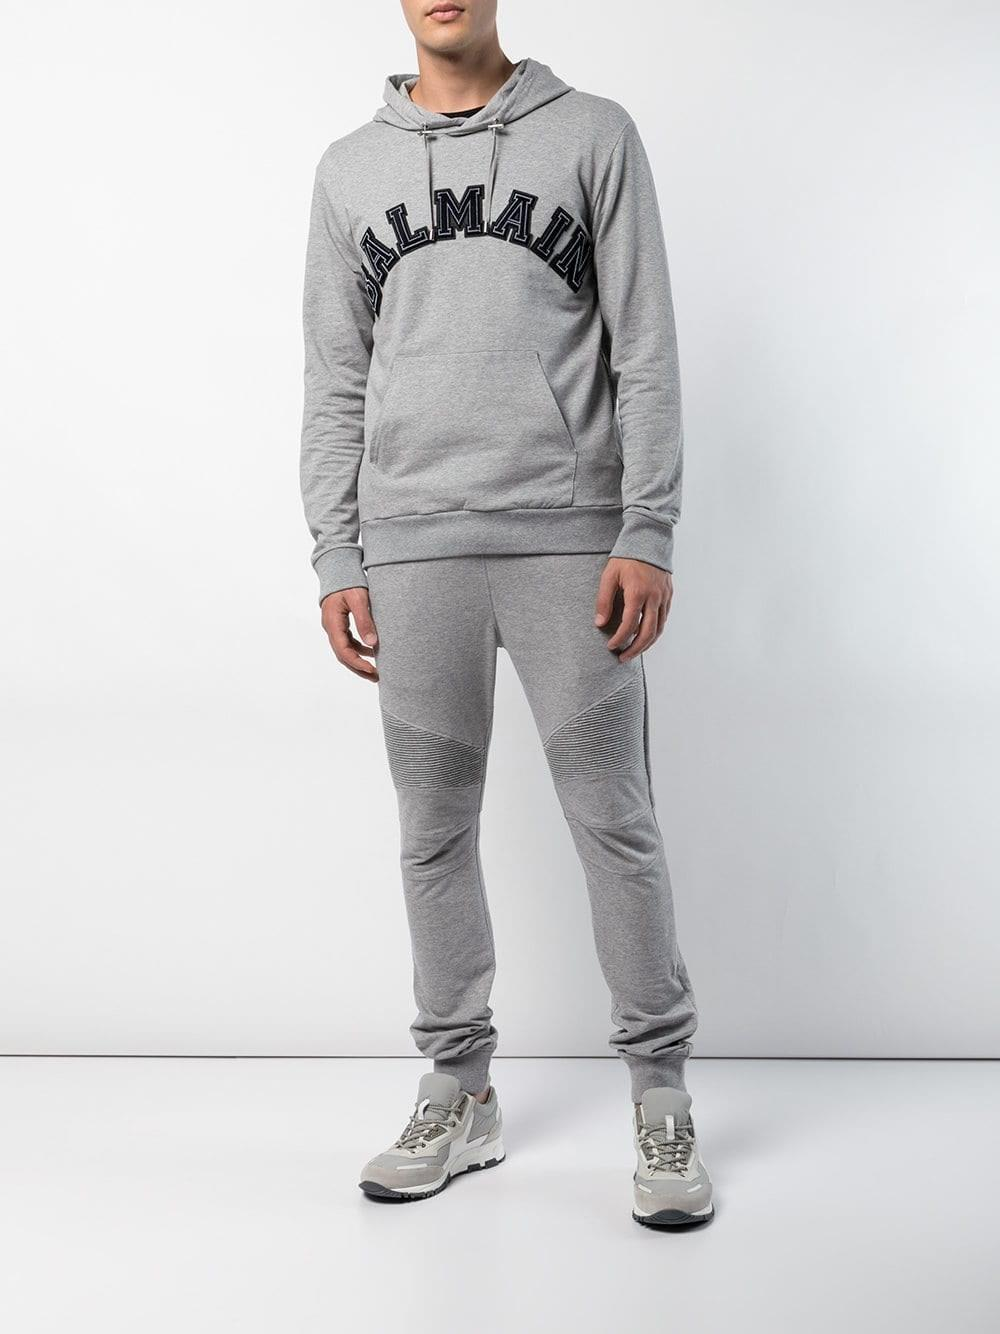 3a2003d38d3 Balmain - Gray Trousers W8h5583j191 170 for Men - Lyst. View fullscreen